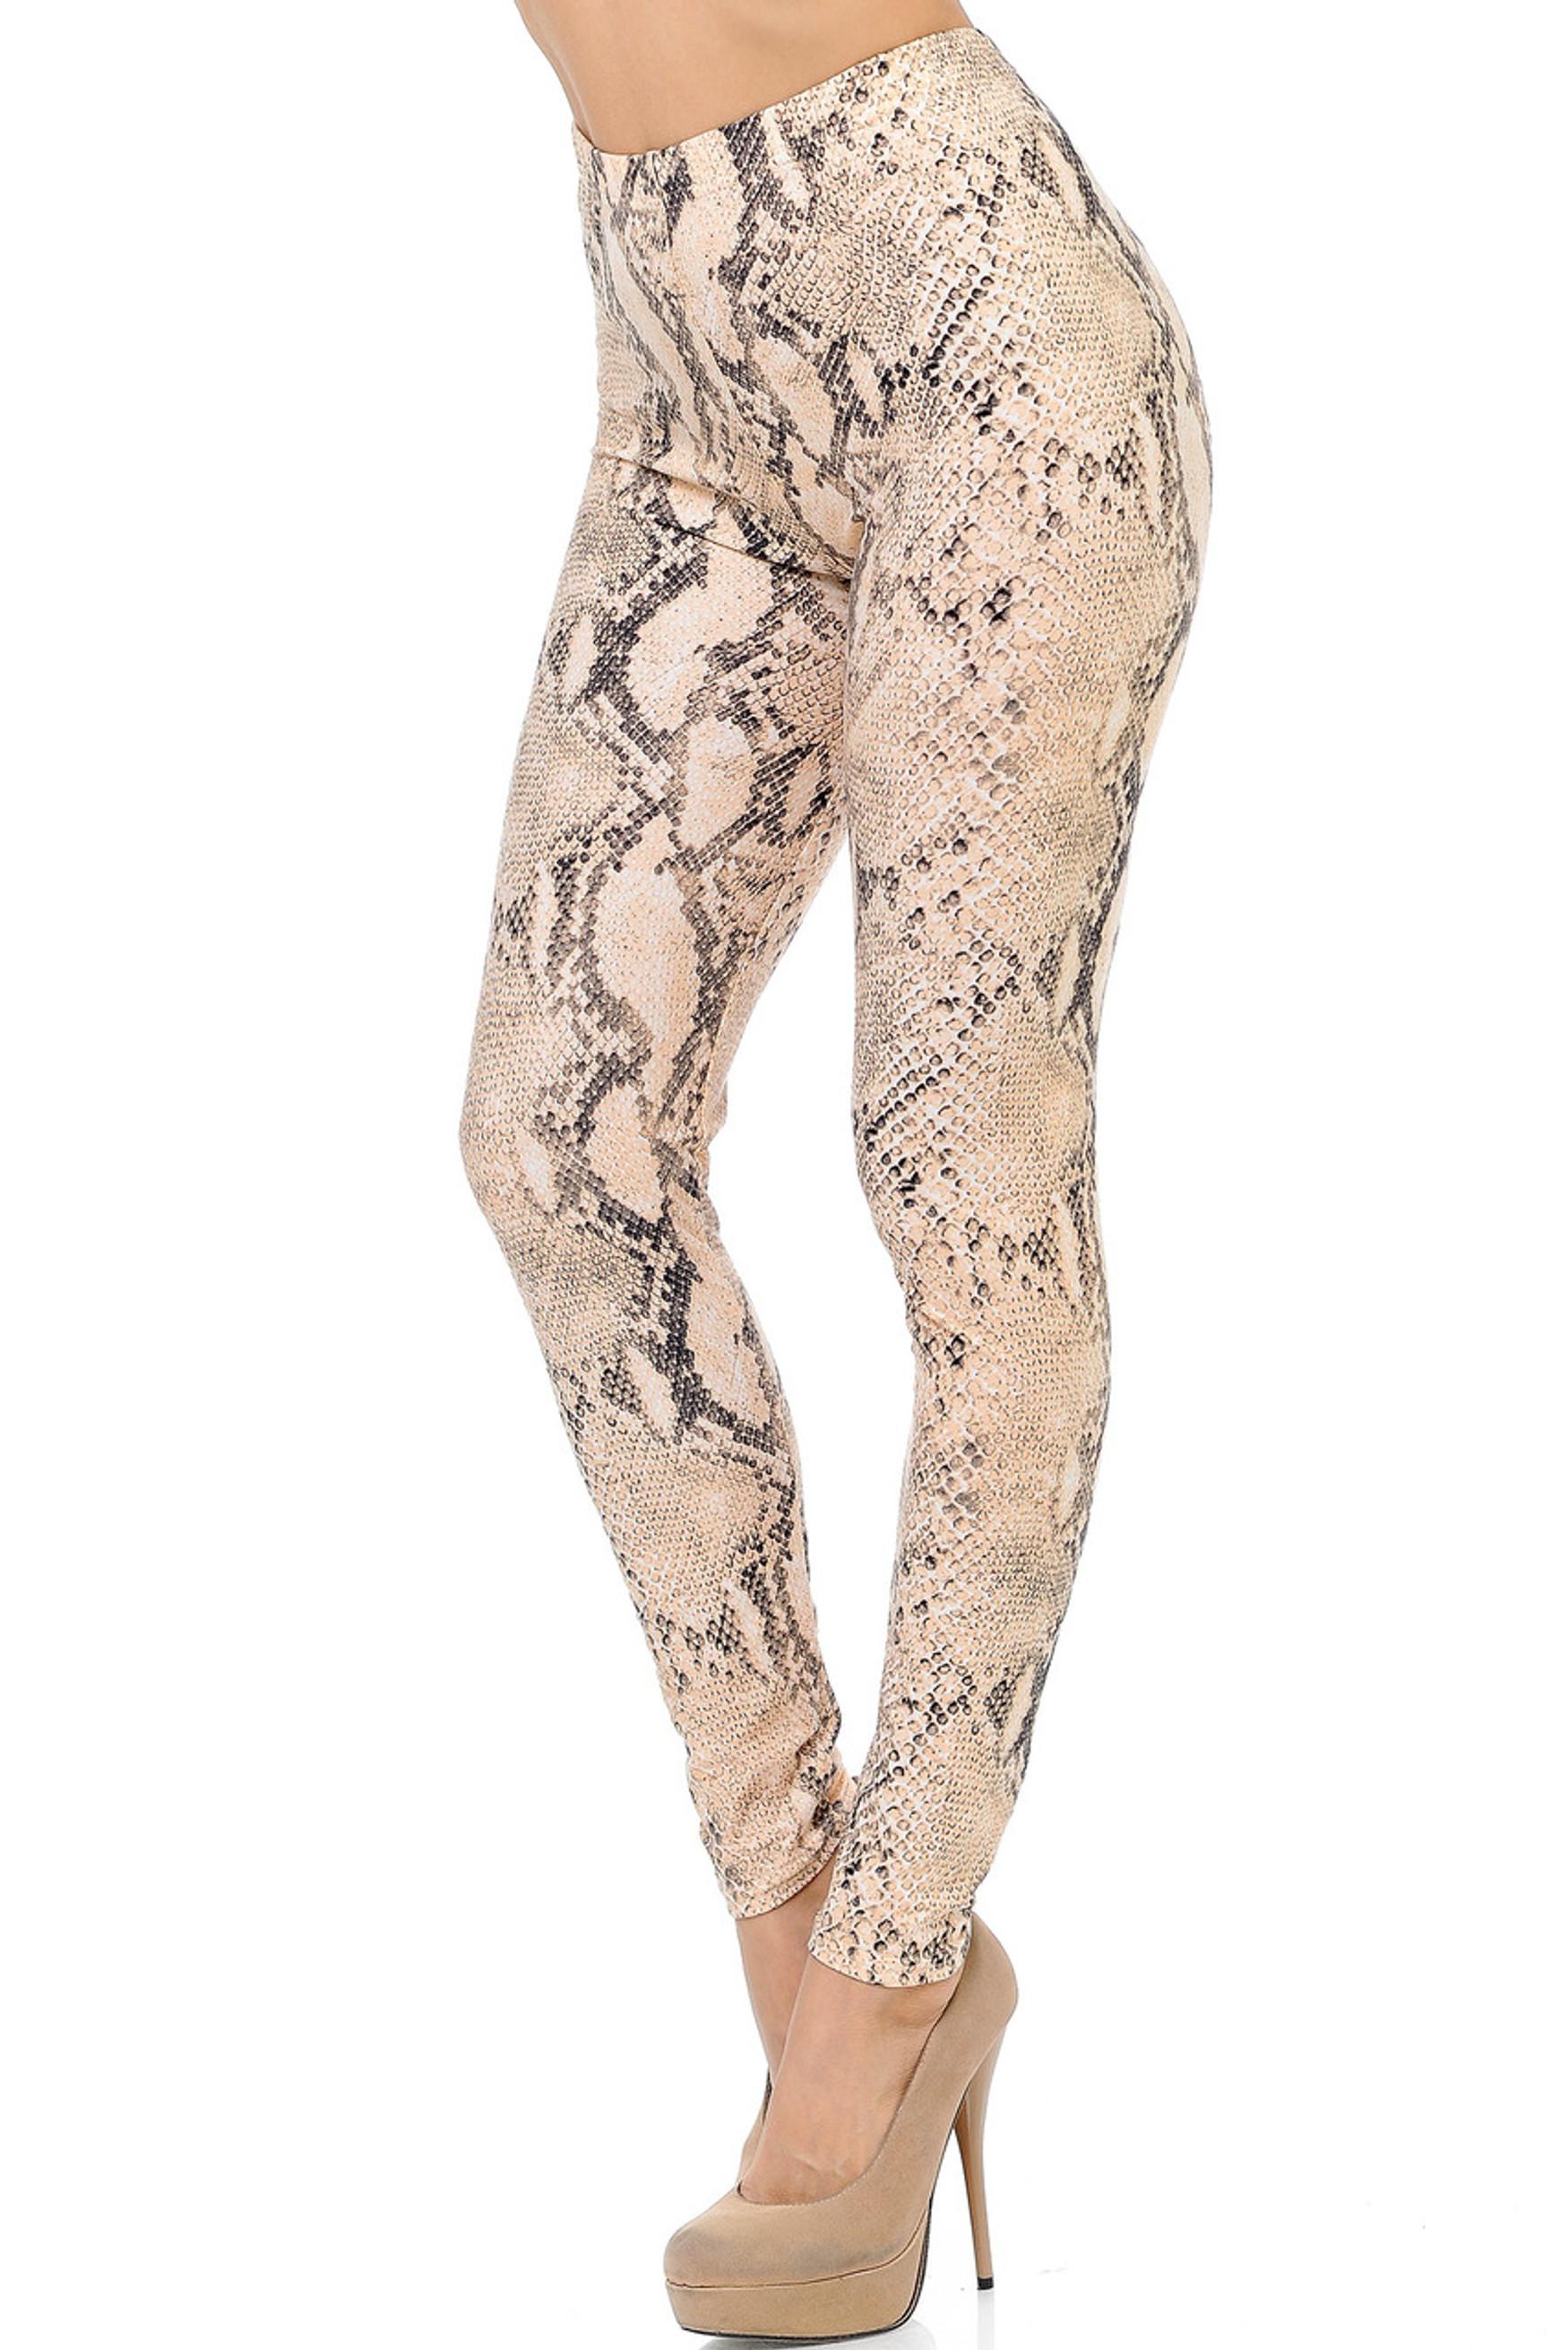 Brushed Cream Snakeskin Plus Size Leggings